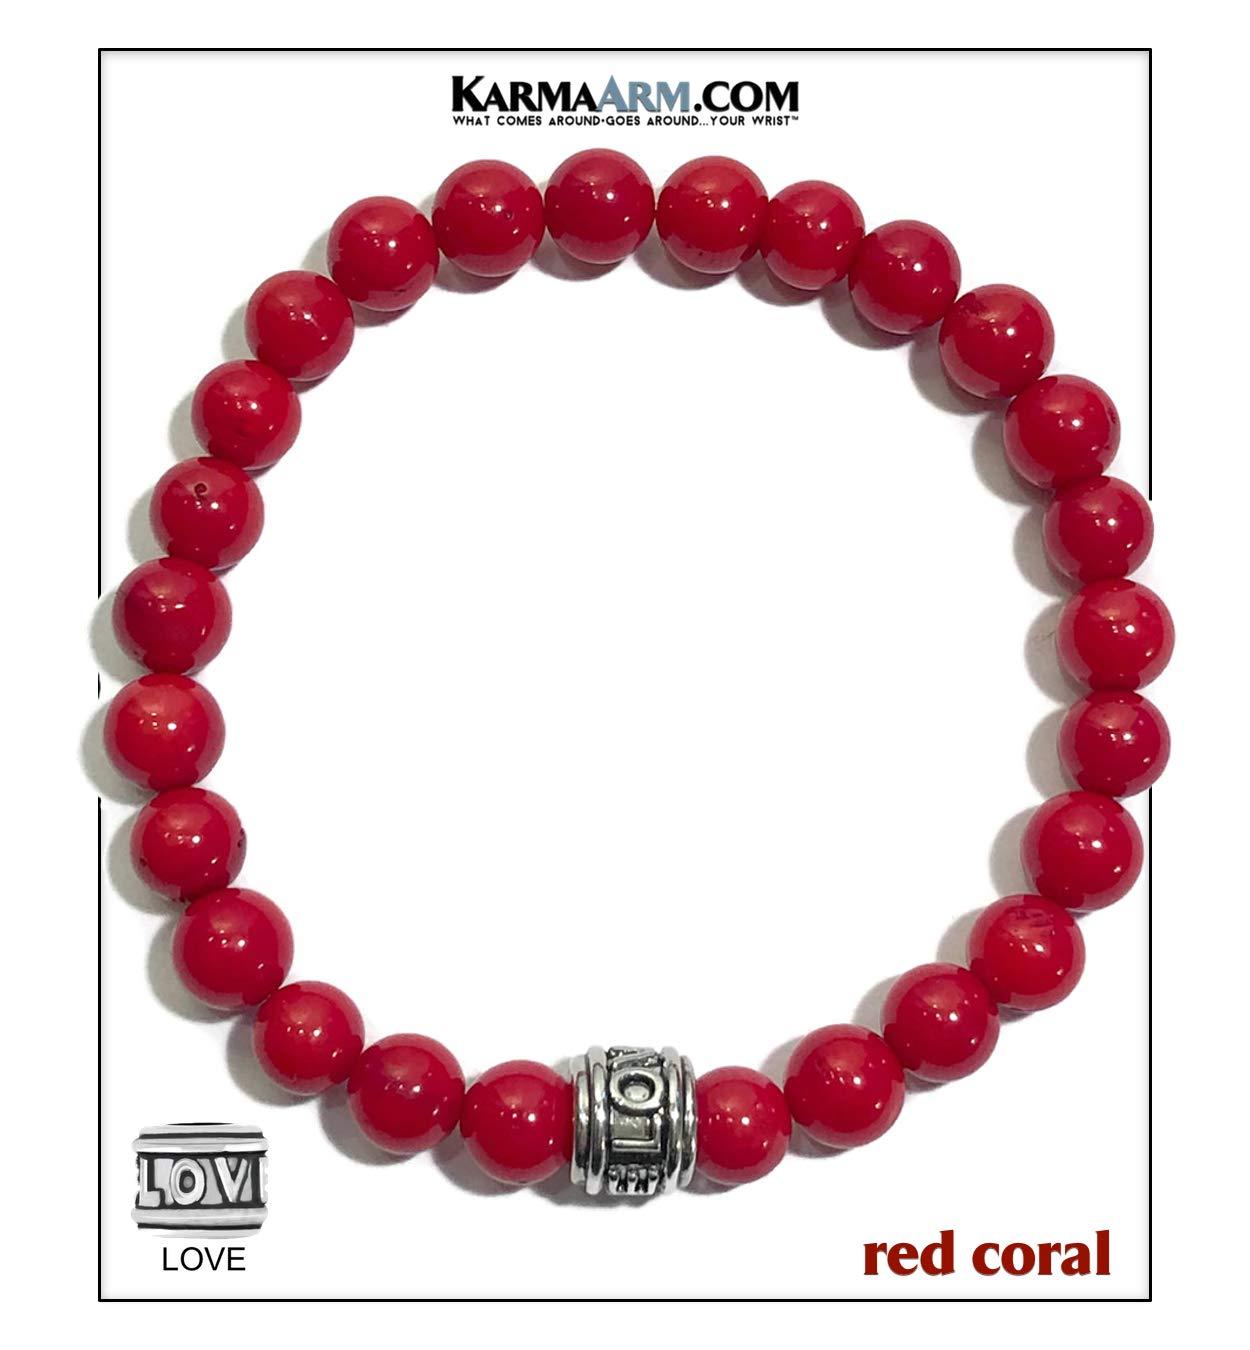 KarmaArm Love Bracelet | Optimism | Red Coral Meditation Mantra Mala | Reiki Healing Energy Beaded Anxiety Calming Zen Wellness Self-Care Chakra Yoga Wristband Bead Jewelry (7)